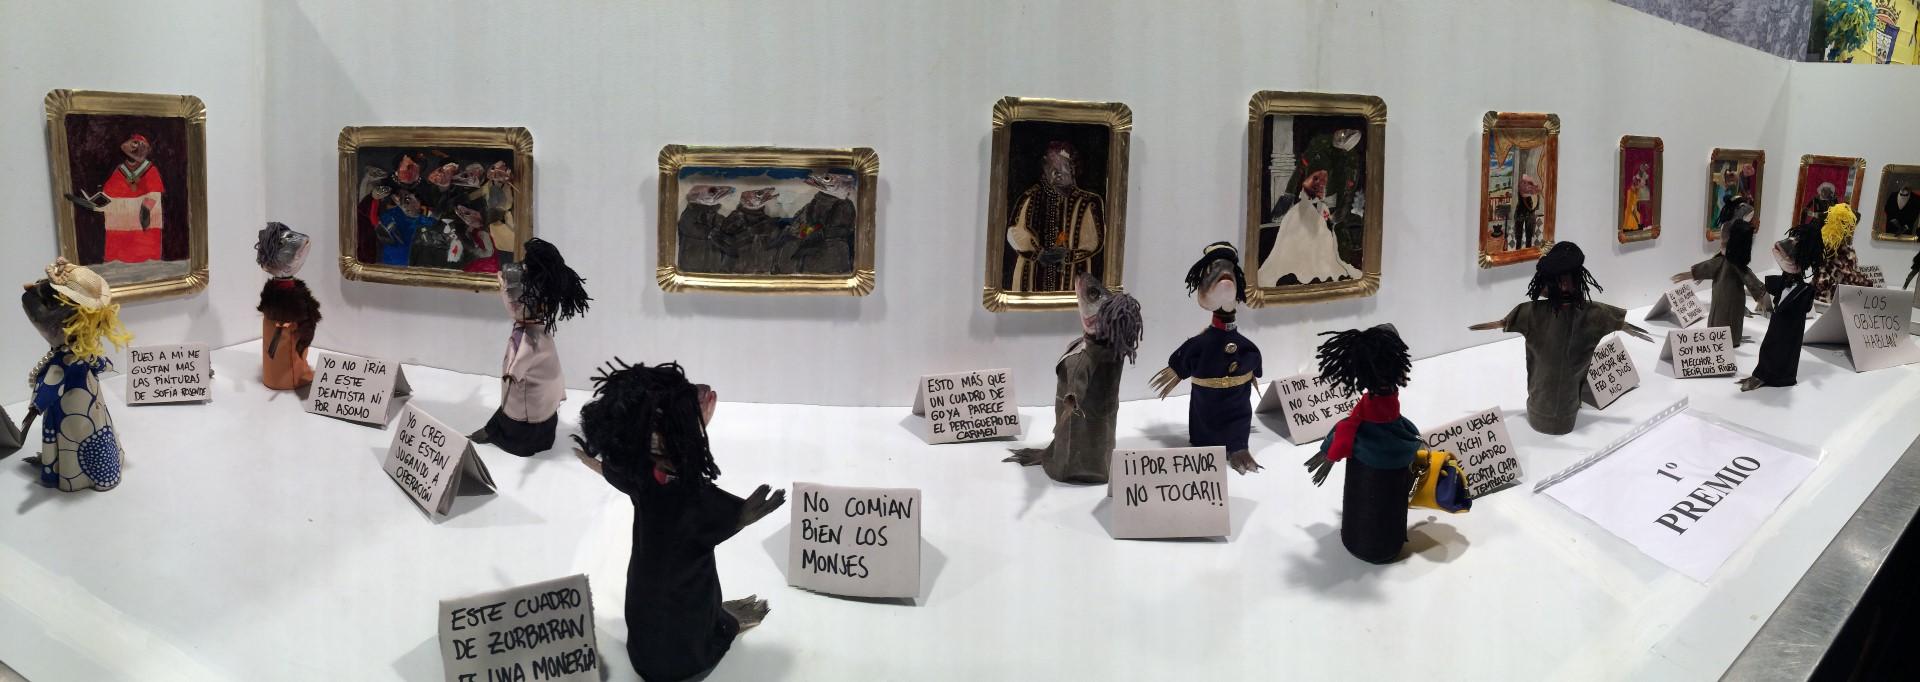 Puppets with fish heads in a miniature art gallery setting. IMAGE: David Ibáñez Montañez, Turismo Cadiz